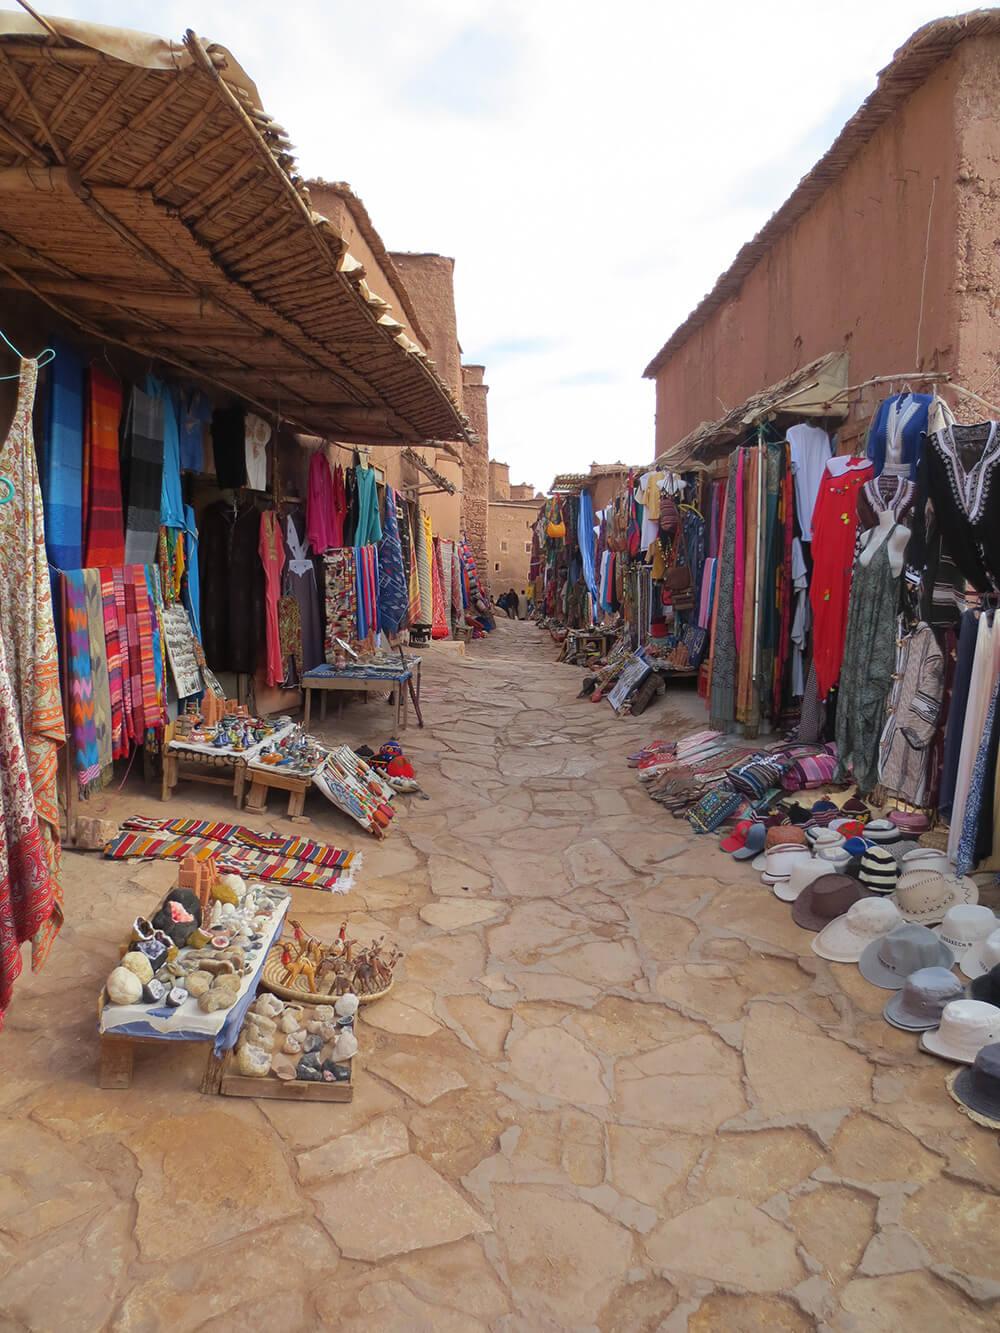 http://www.marrakechdream.ma/wp-content/uploads/2017/07/IMG_2783.jpg